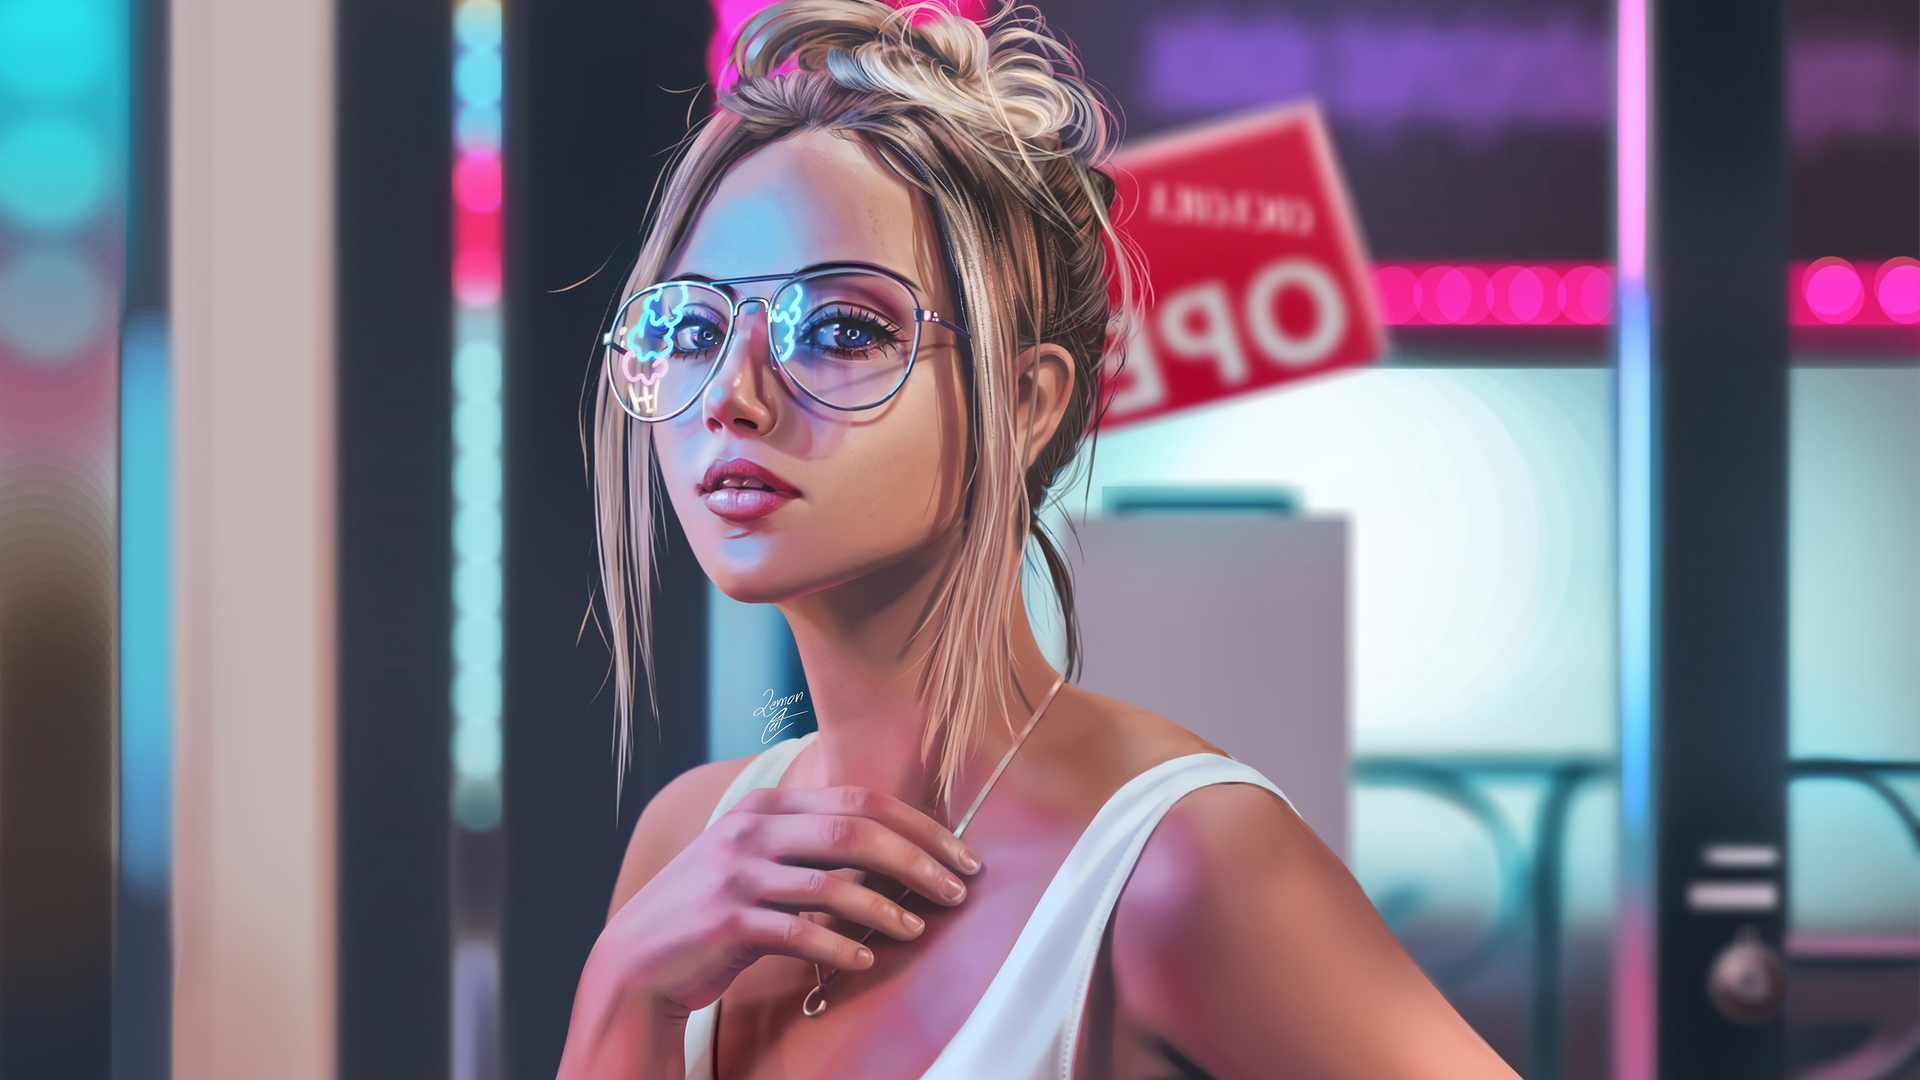 blonde-girl-neon-digital-art-4k-2a.jpg